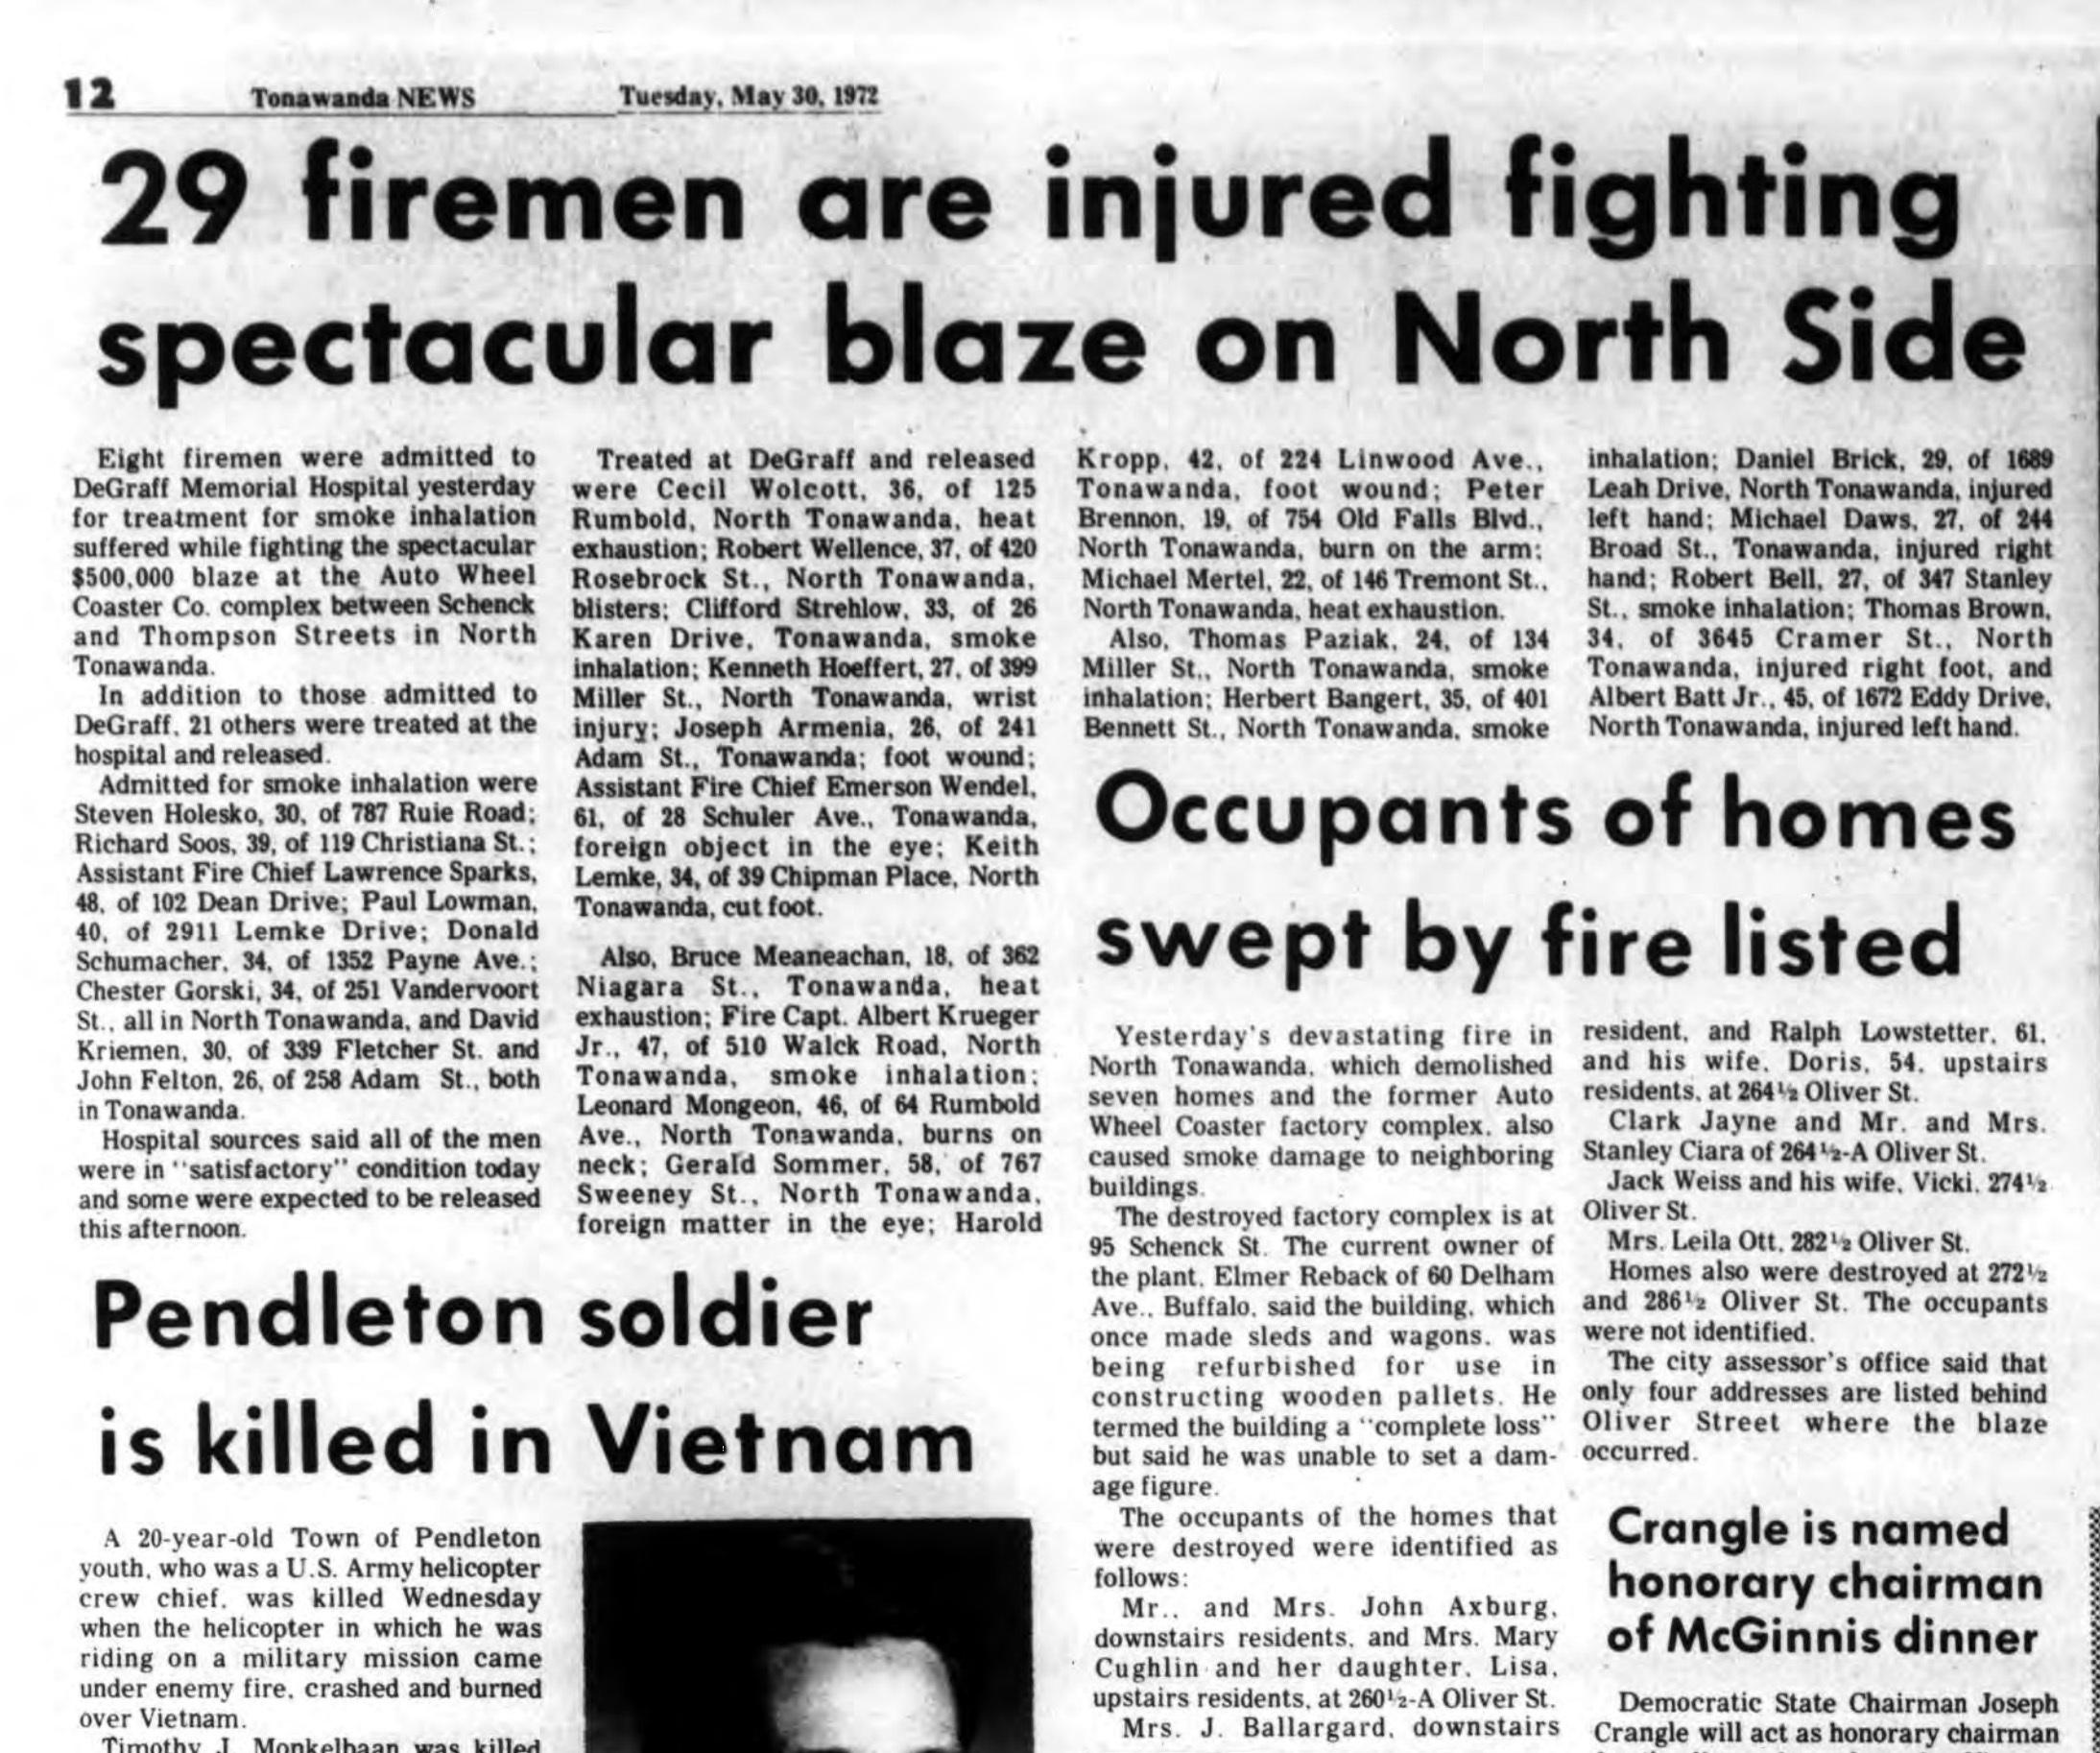 29 firemen injured fighting specactular blaze, article (1972-05-30).jpg